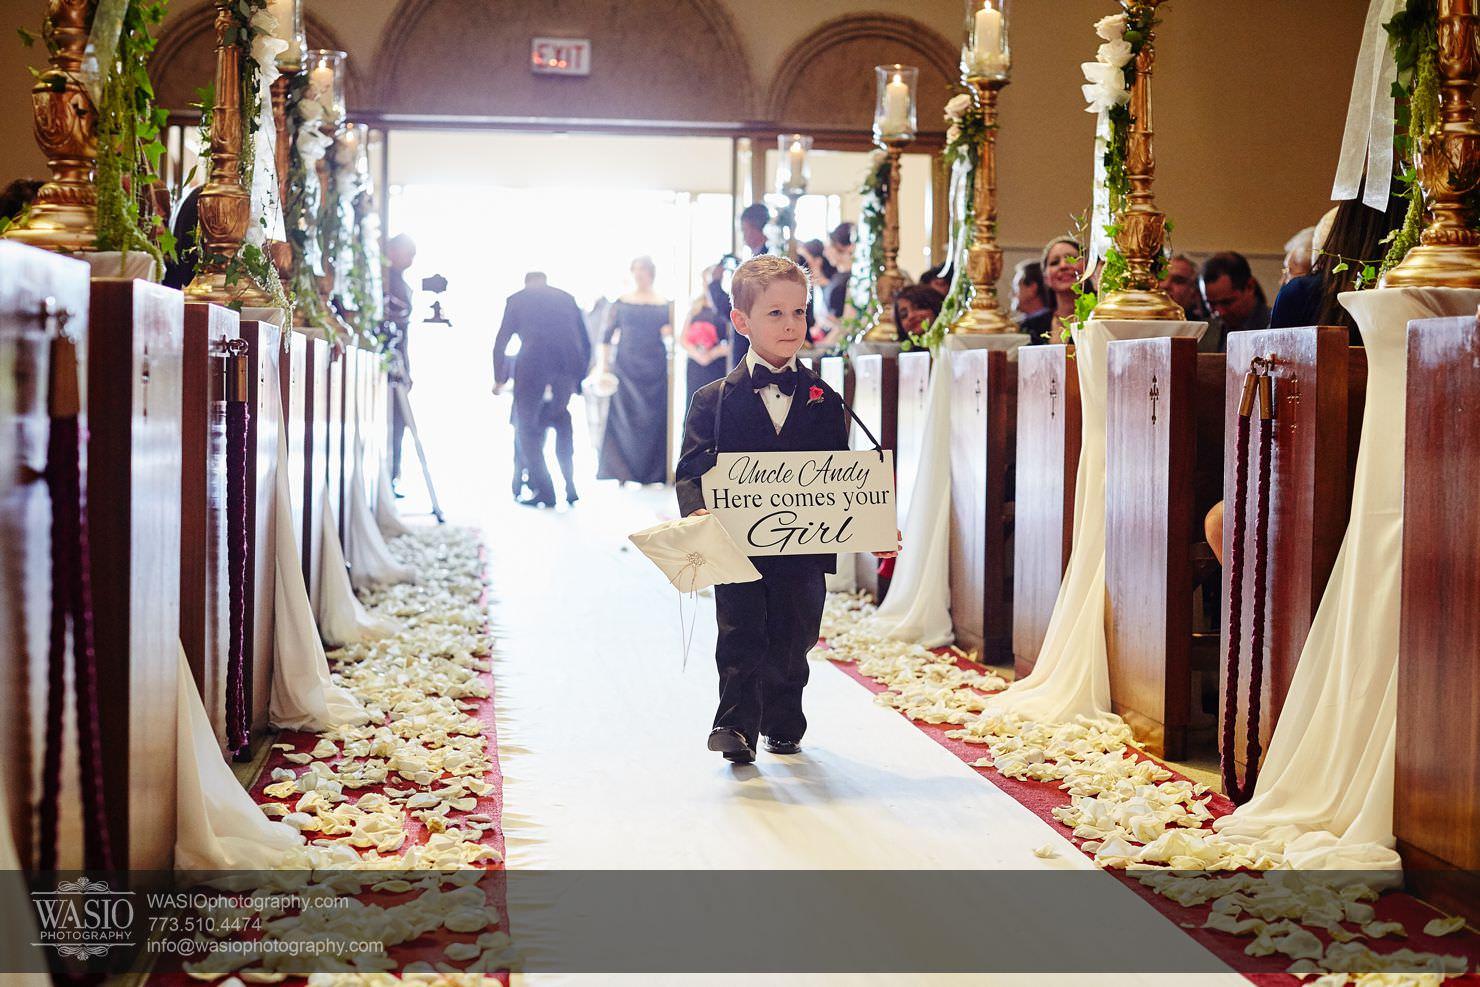 017_Chicago-Spring-Wedding_Chrissy-Andrew_3P4C5476-1 Chicago Spring Wedding - Chrissy + Andrew